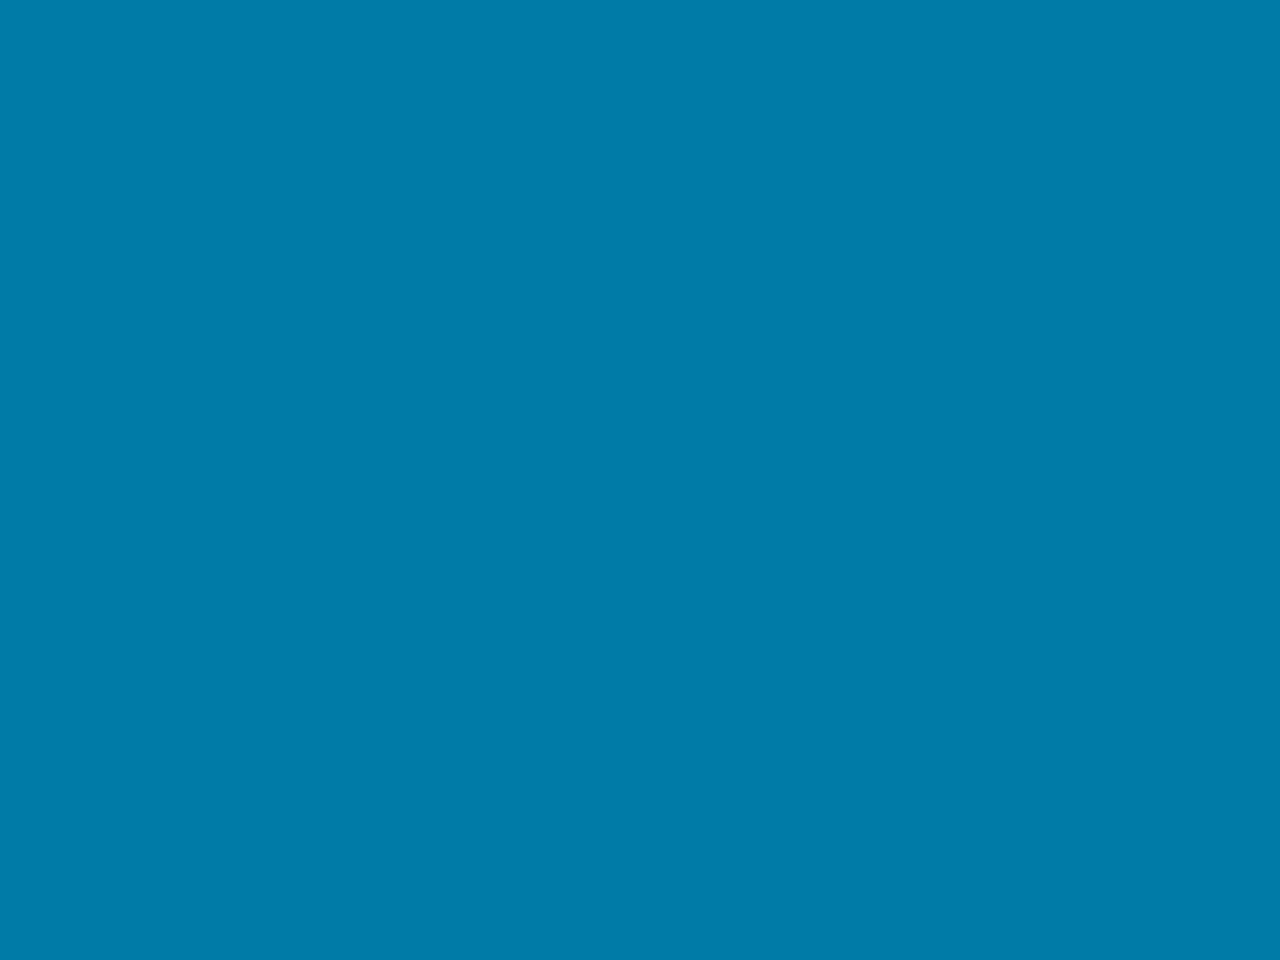 1280x960 Celadon Blue Solid Color Background